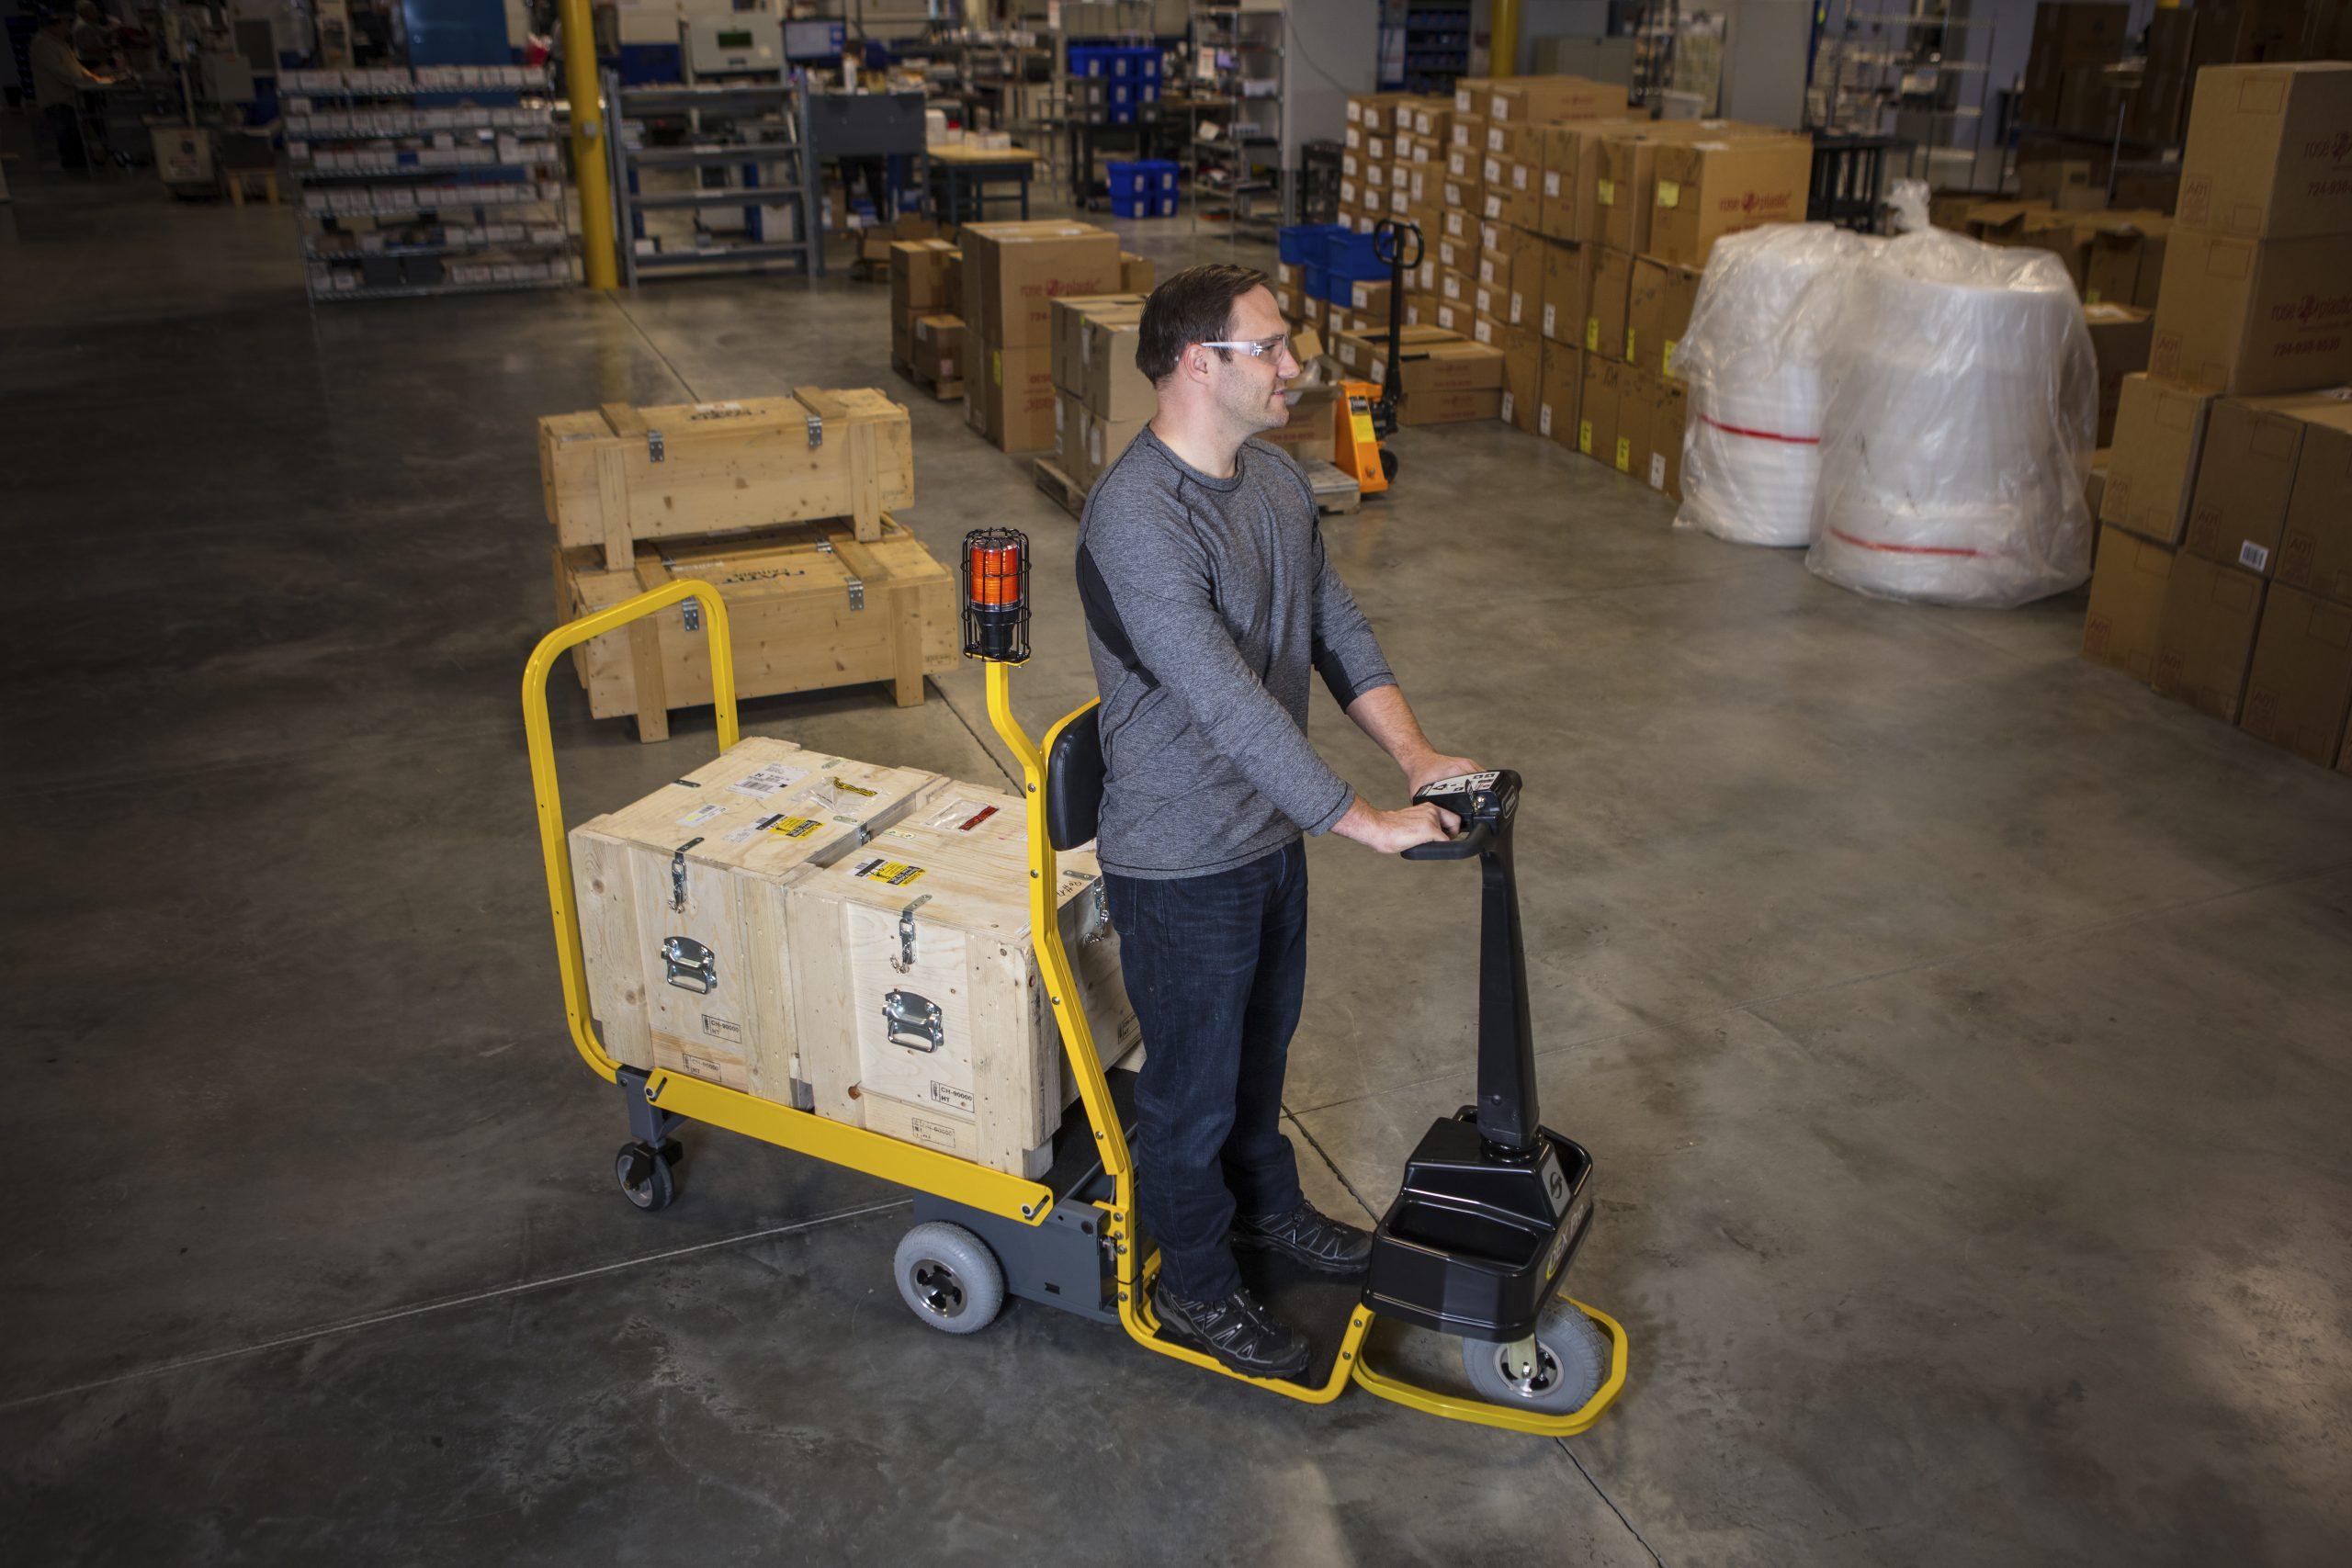 amigo-mobility-dex-pro-burden-carrier-warehouse-vehicle